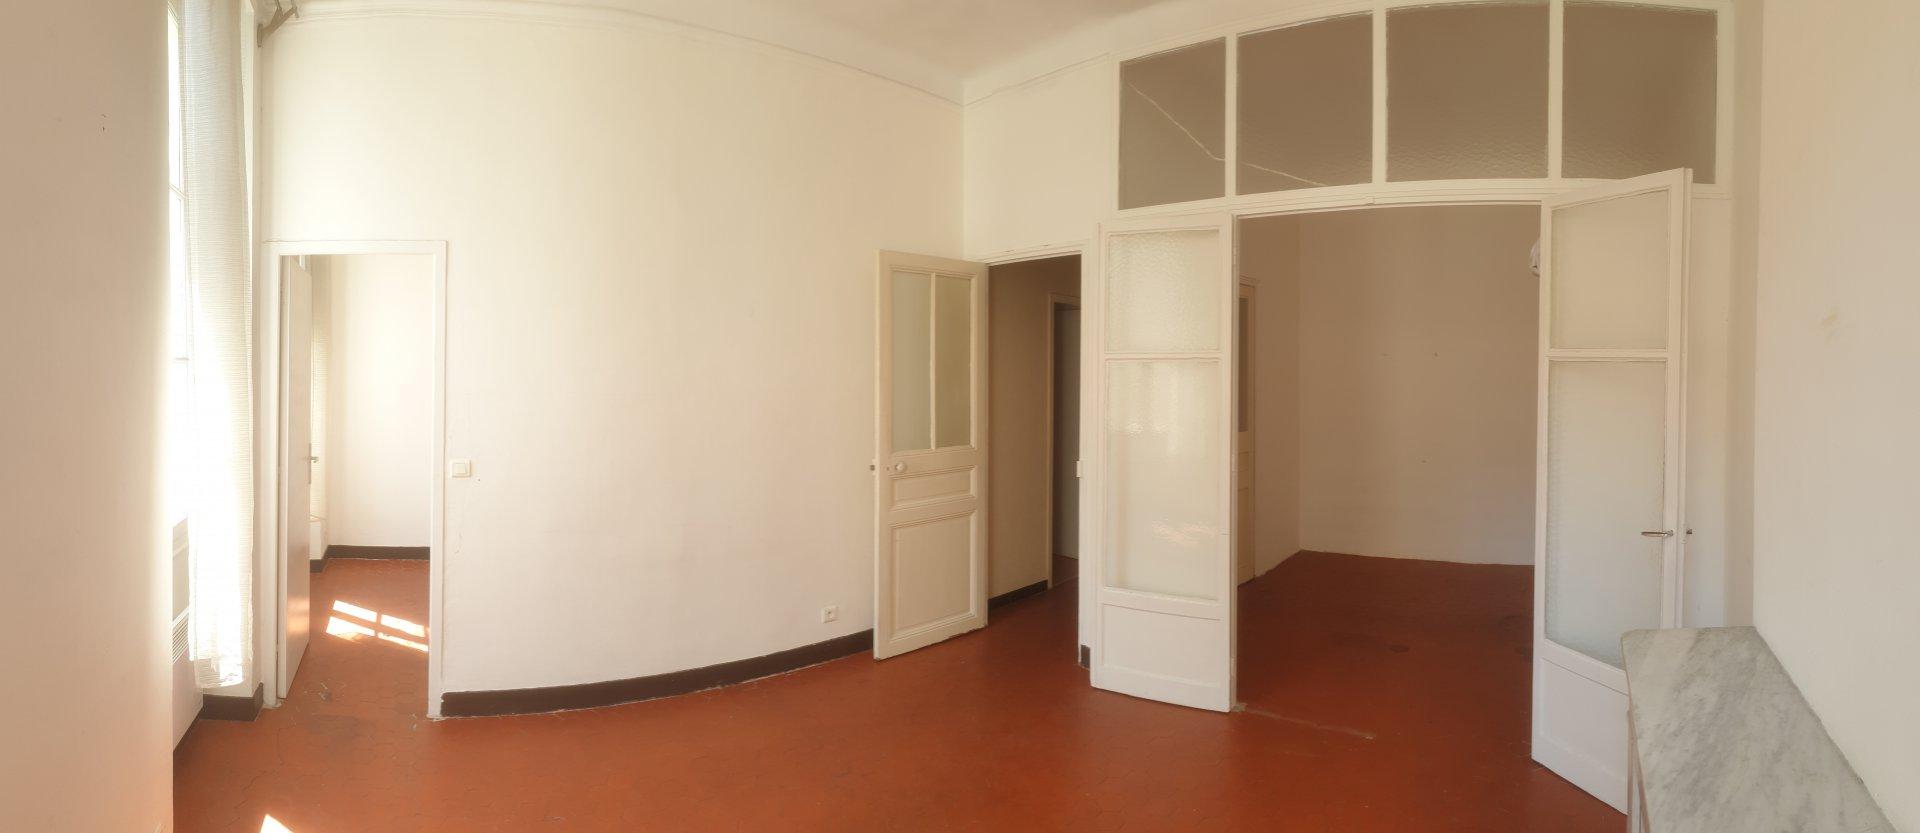 T2 - Rue Linné